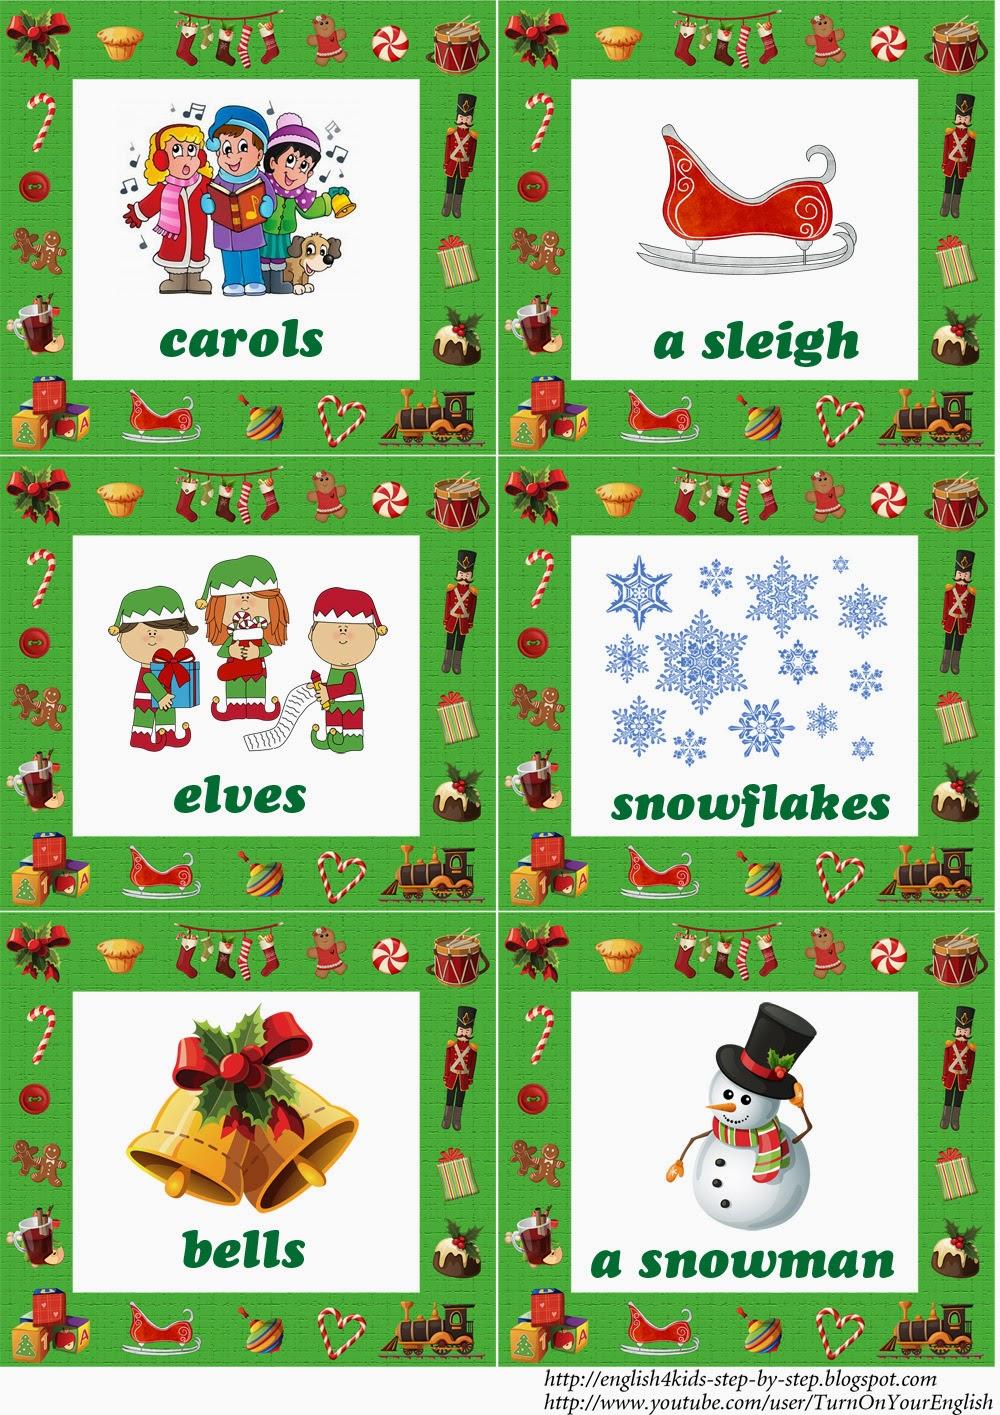 Christmas Fun Song for Kids (+ Flashcards)